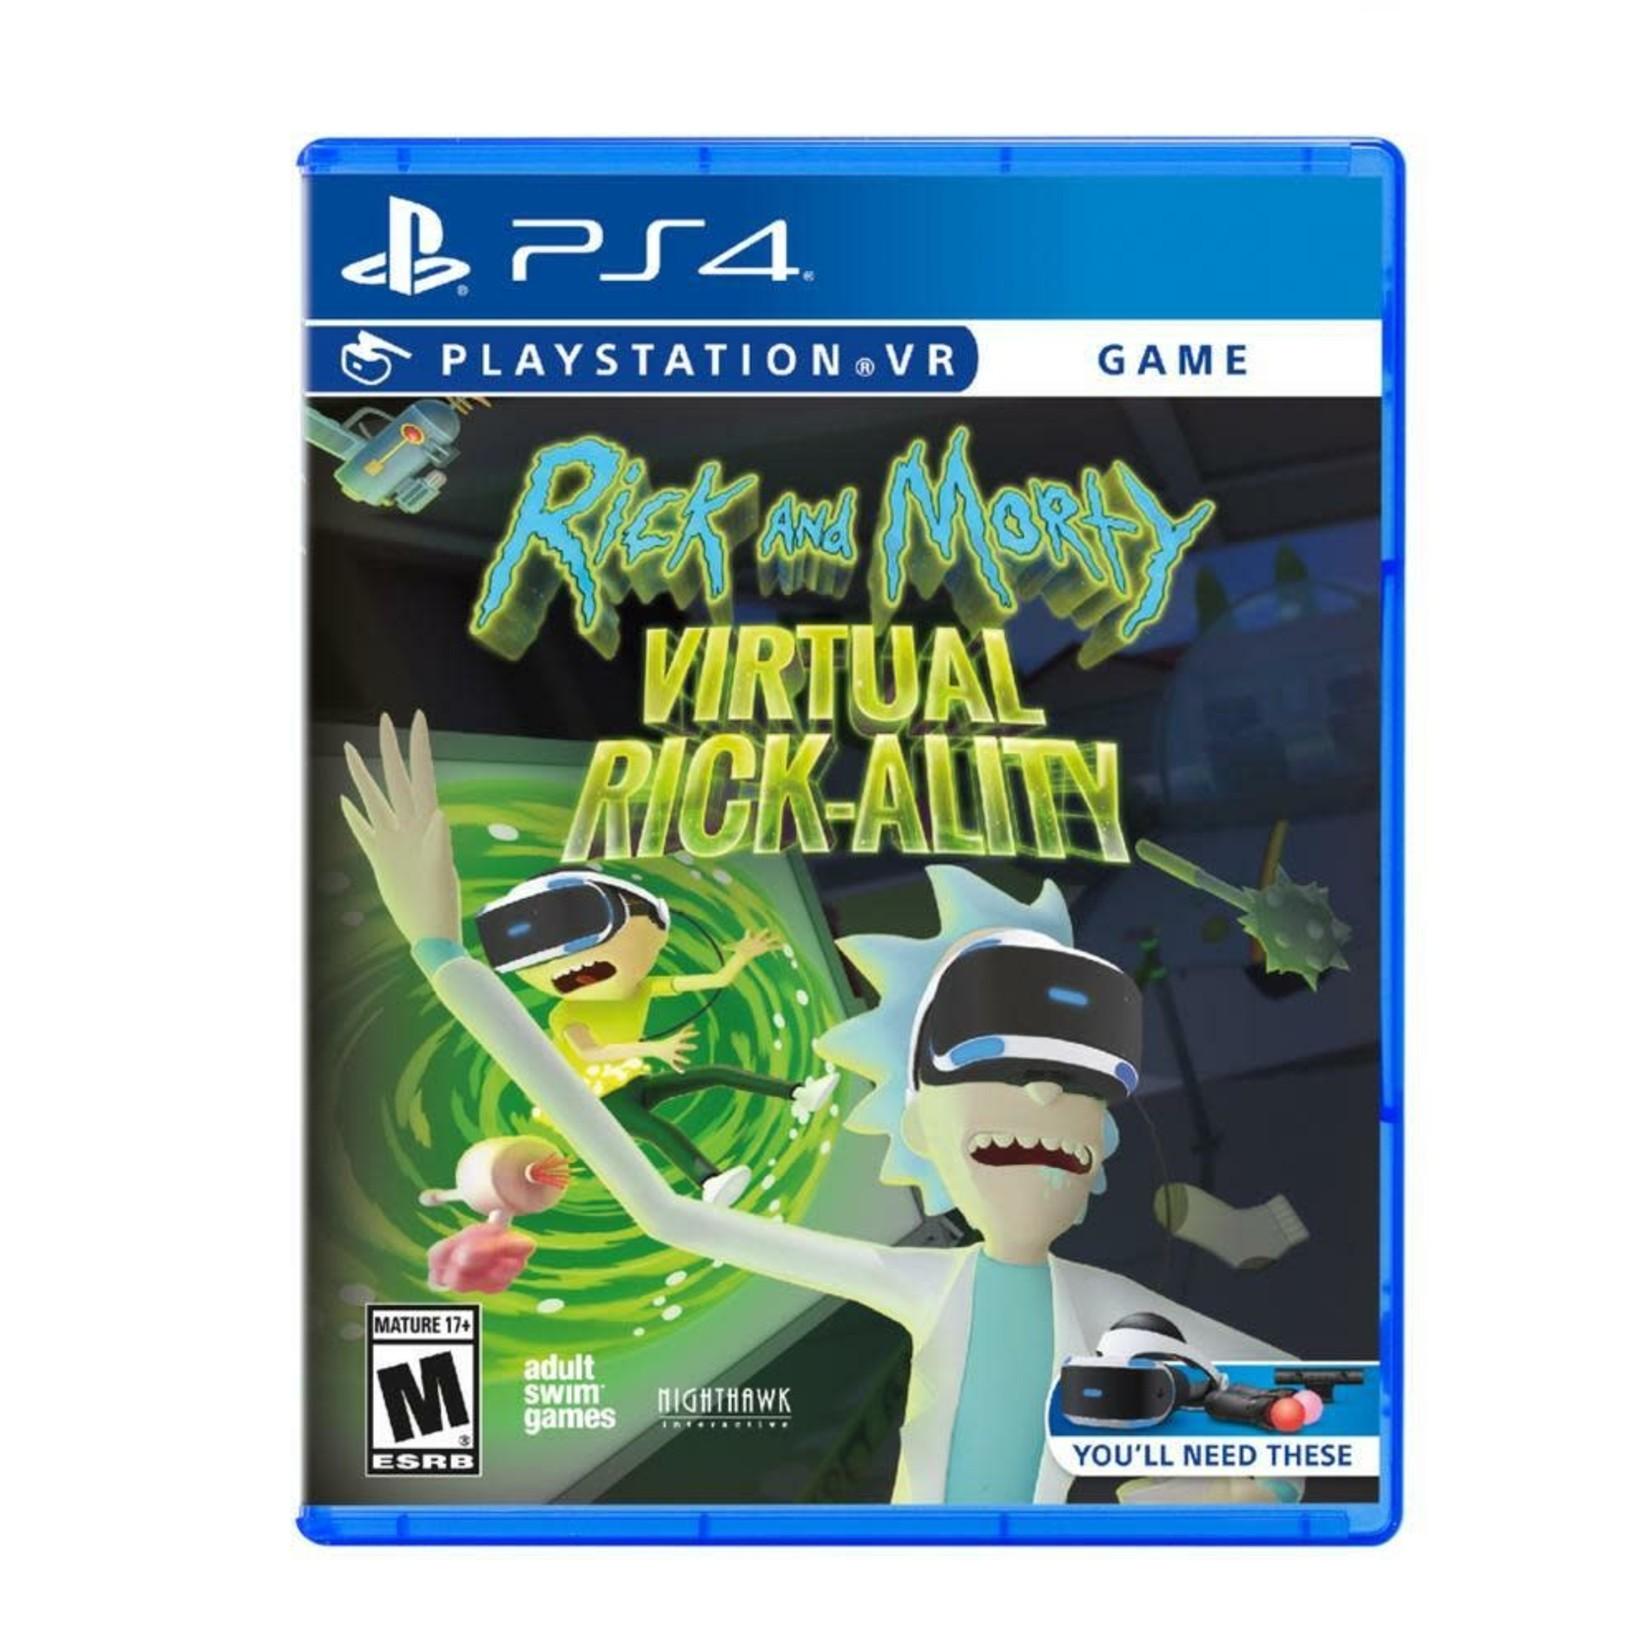 ps4-Rick and Morty Virtual Rick-ality PSVR